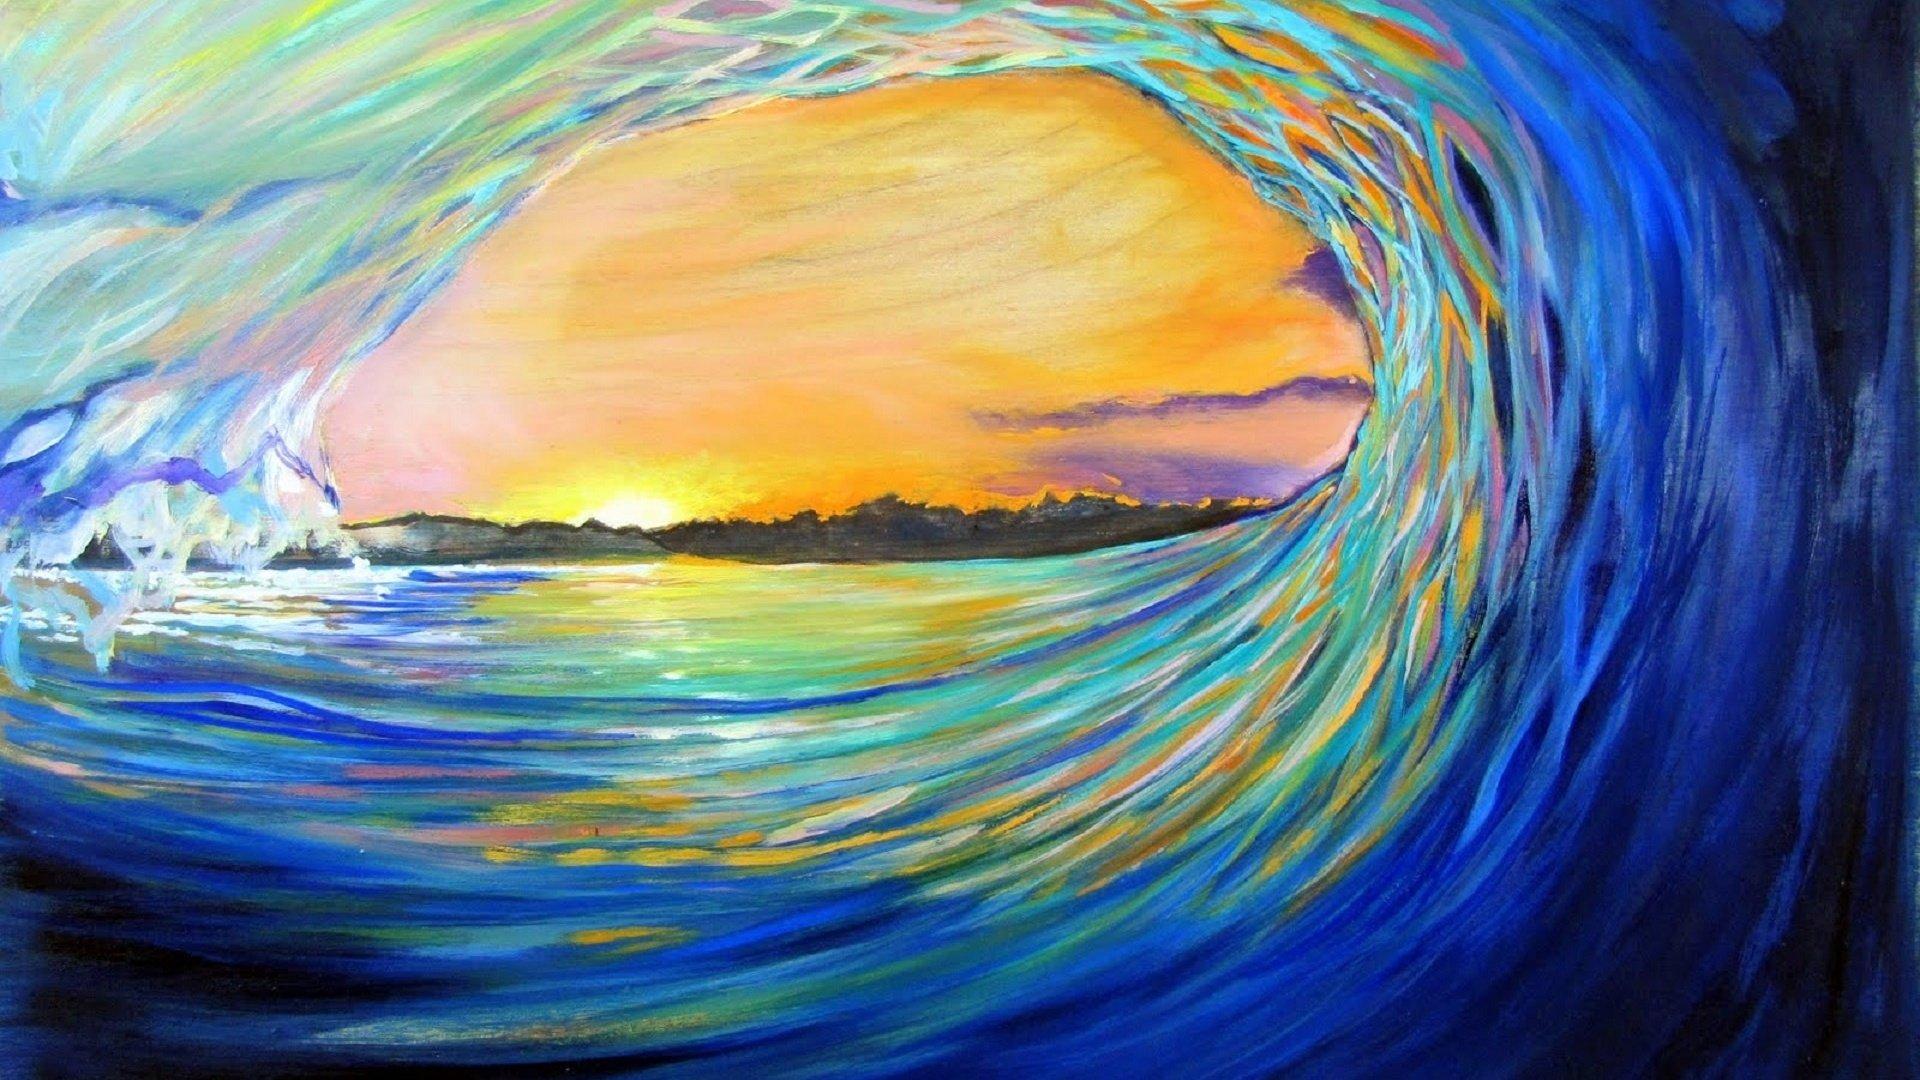 Ocean Wave Fondo De Pantalla Hd Fondo De Escritorio